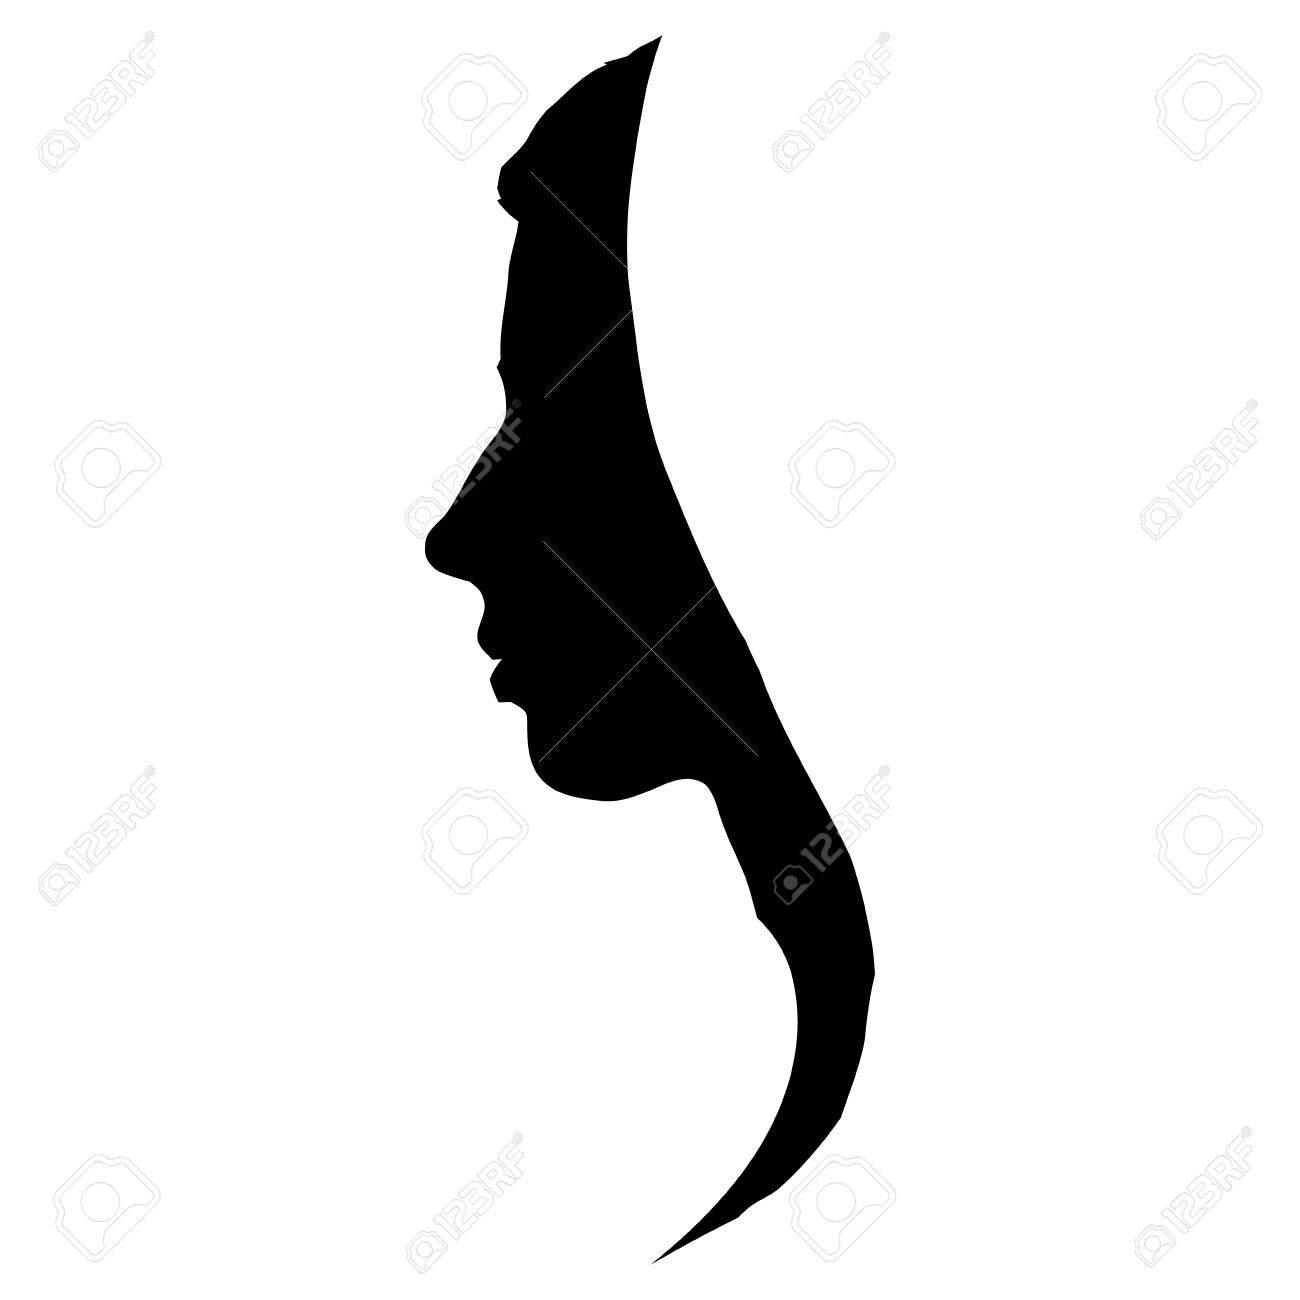 Black Female Silhouette Images.